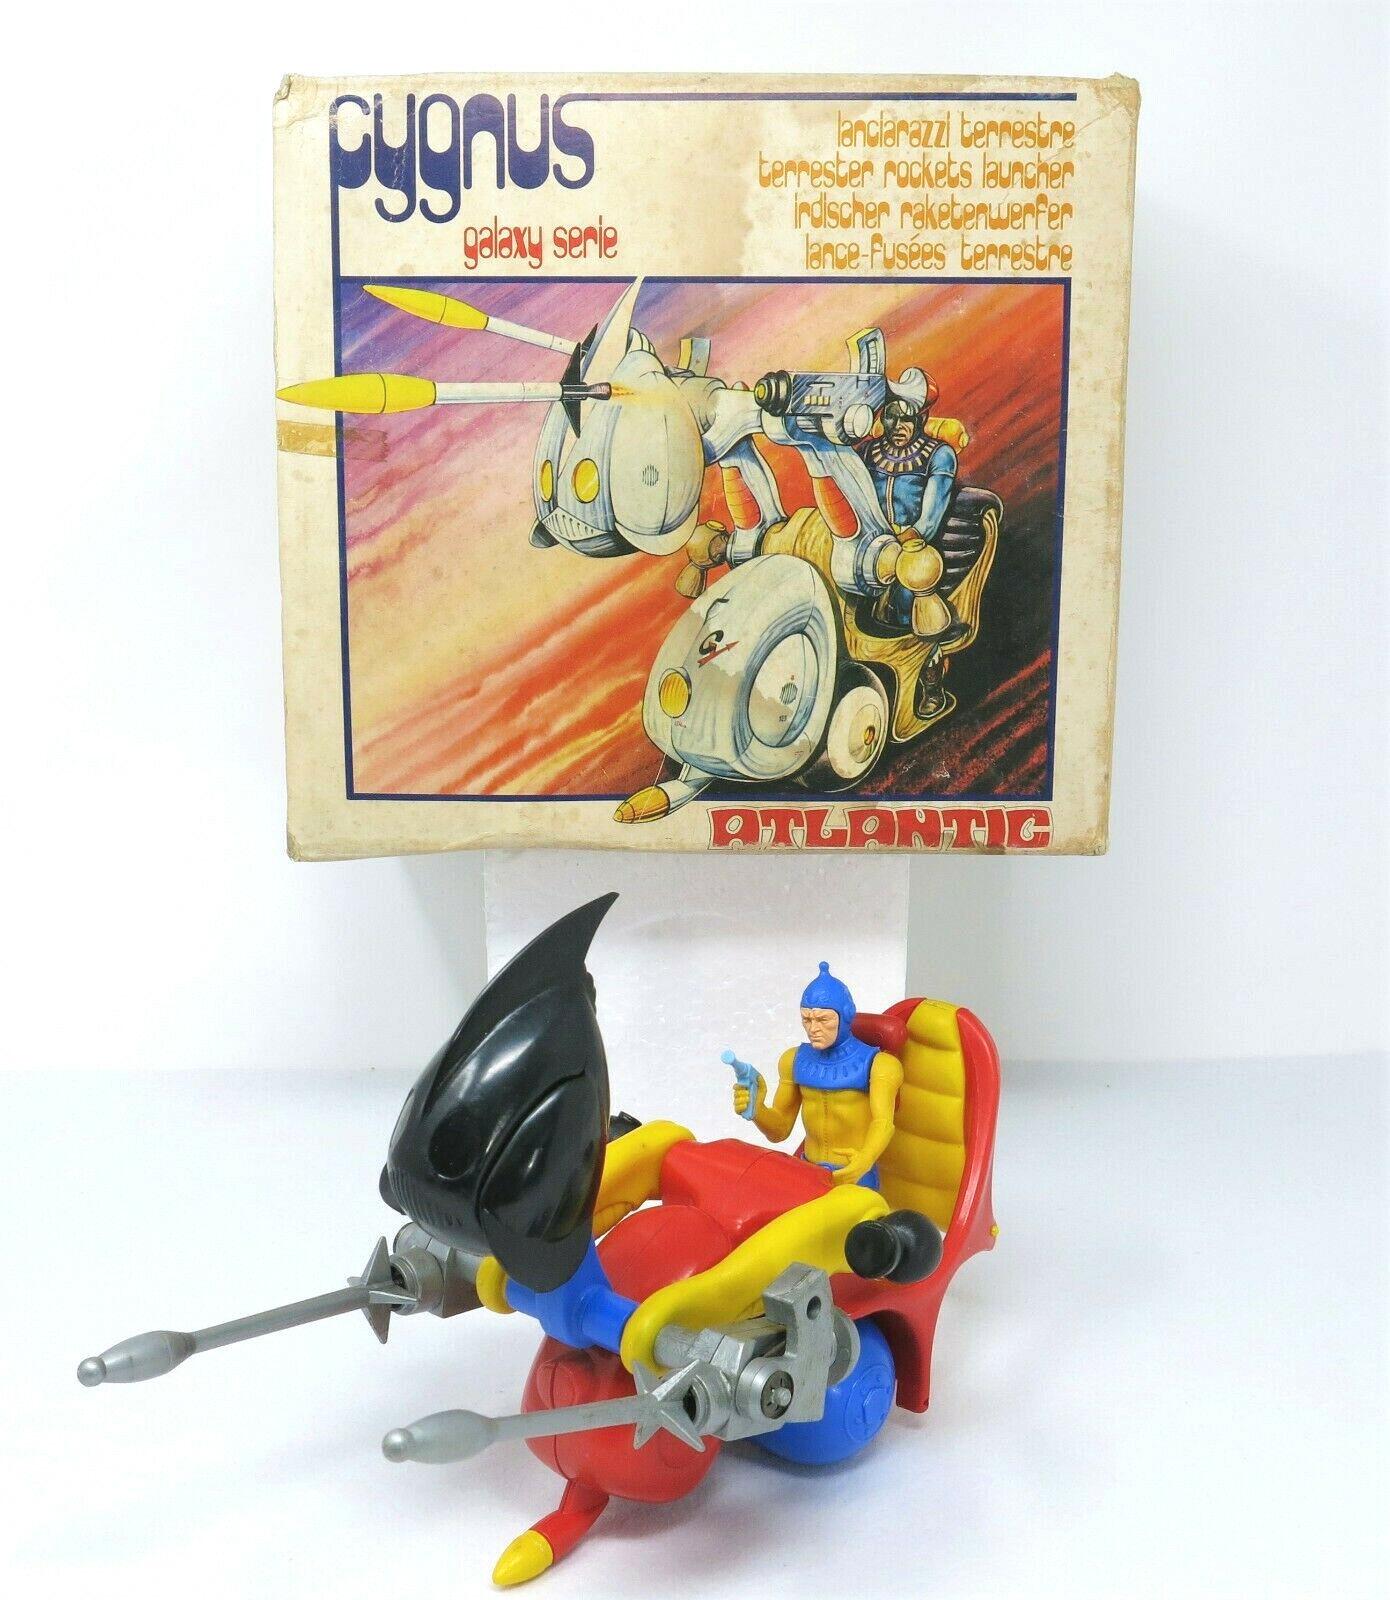 Atlantic Cygnus Skyman galaxy series lanciarazzi action figure vintage in box